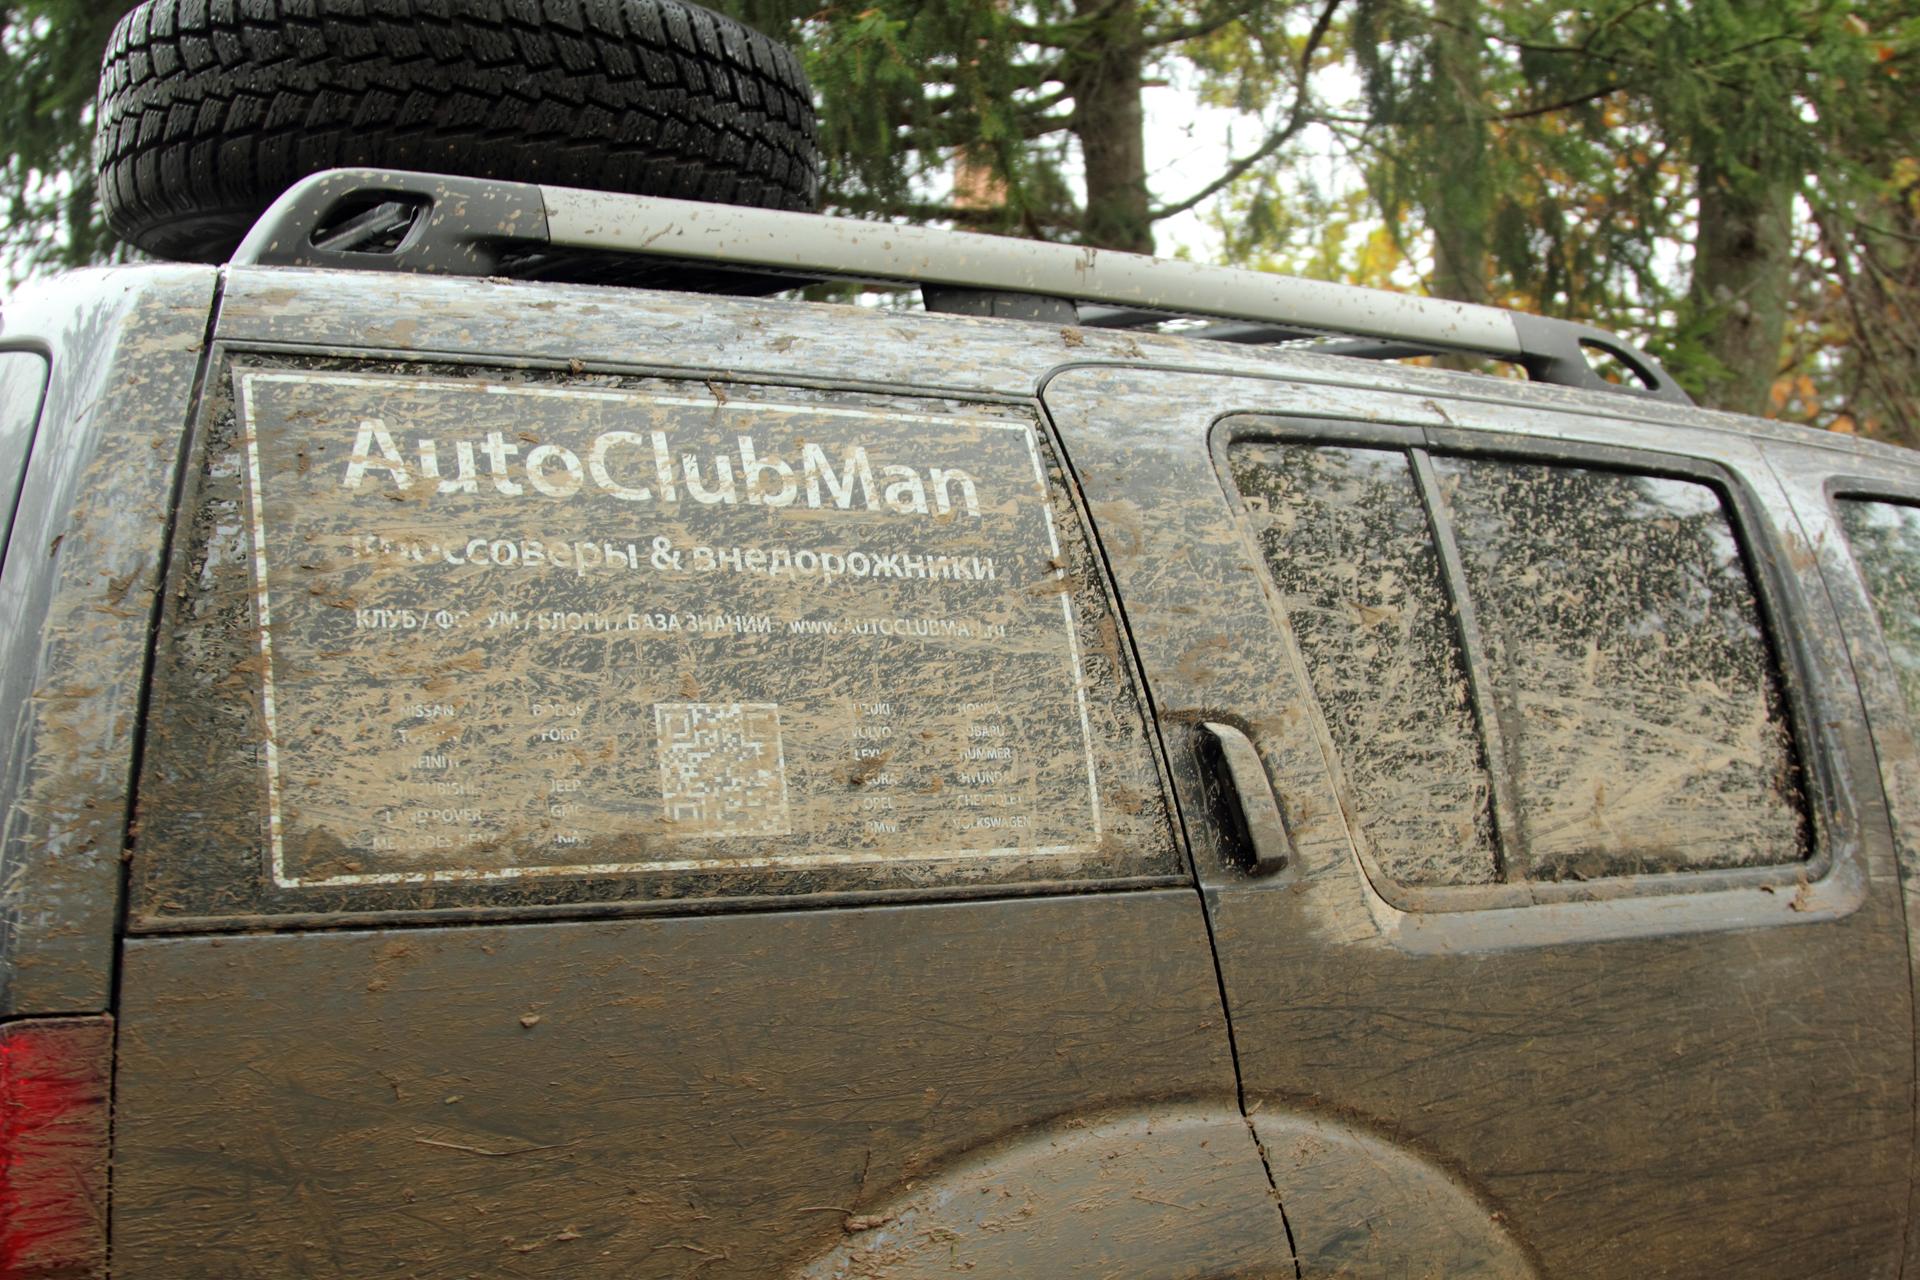 ISEA autoclubman 573